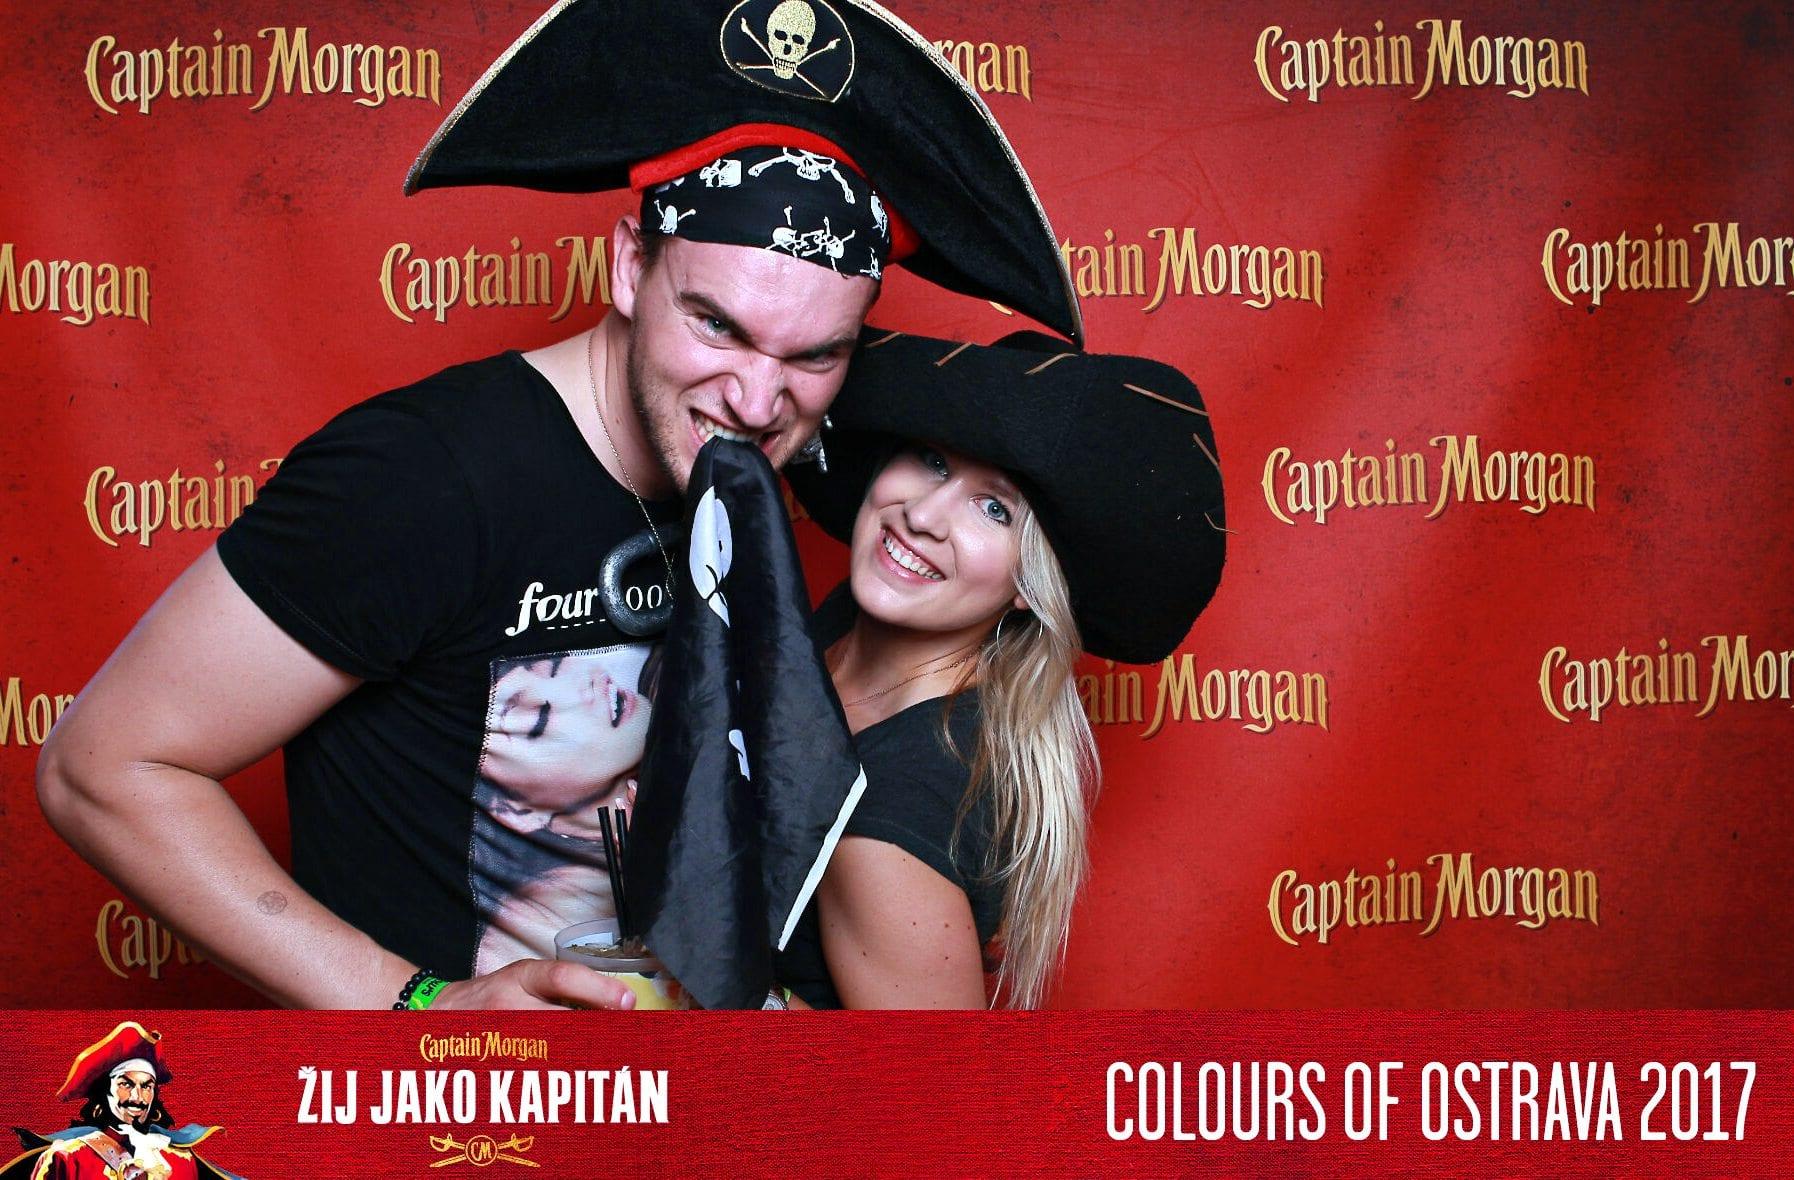 fotokoutek-captain-morgan-20-7-2017-285224